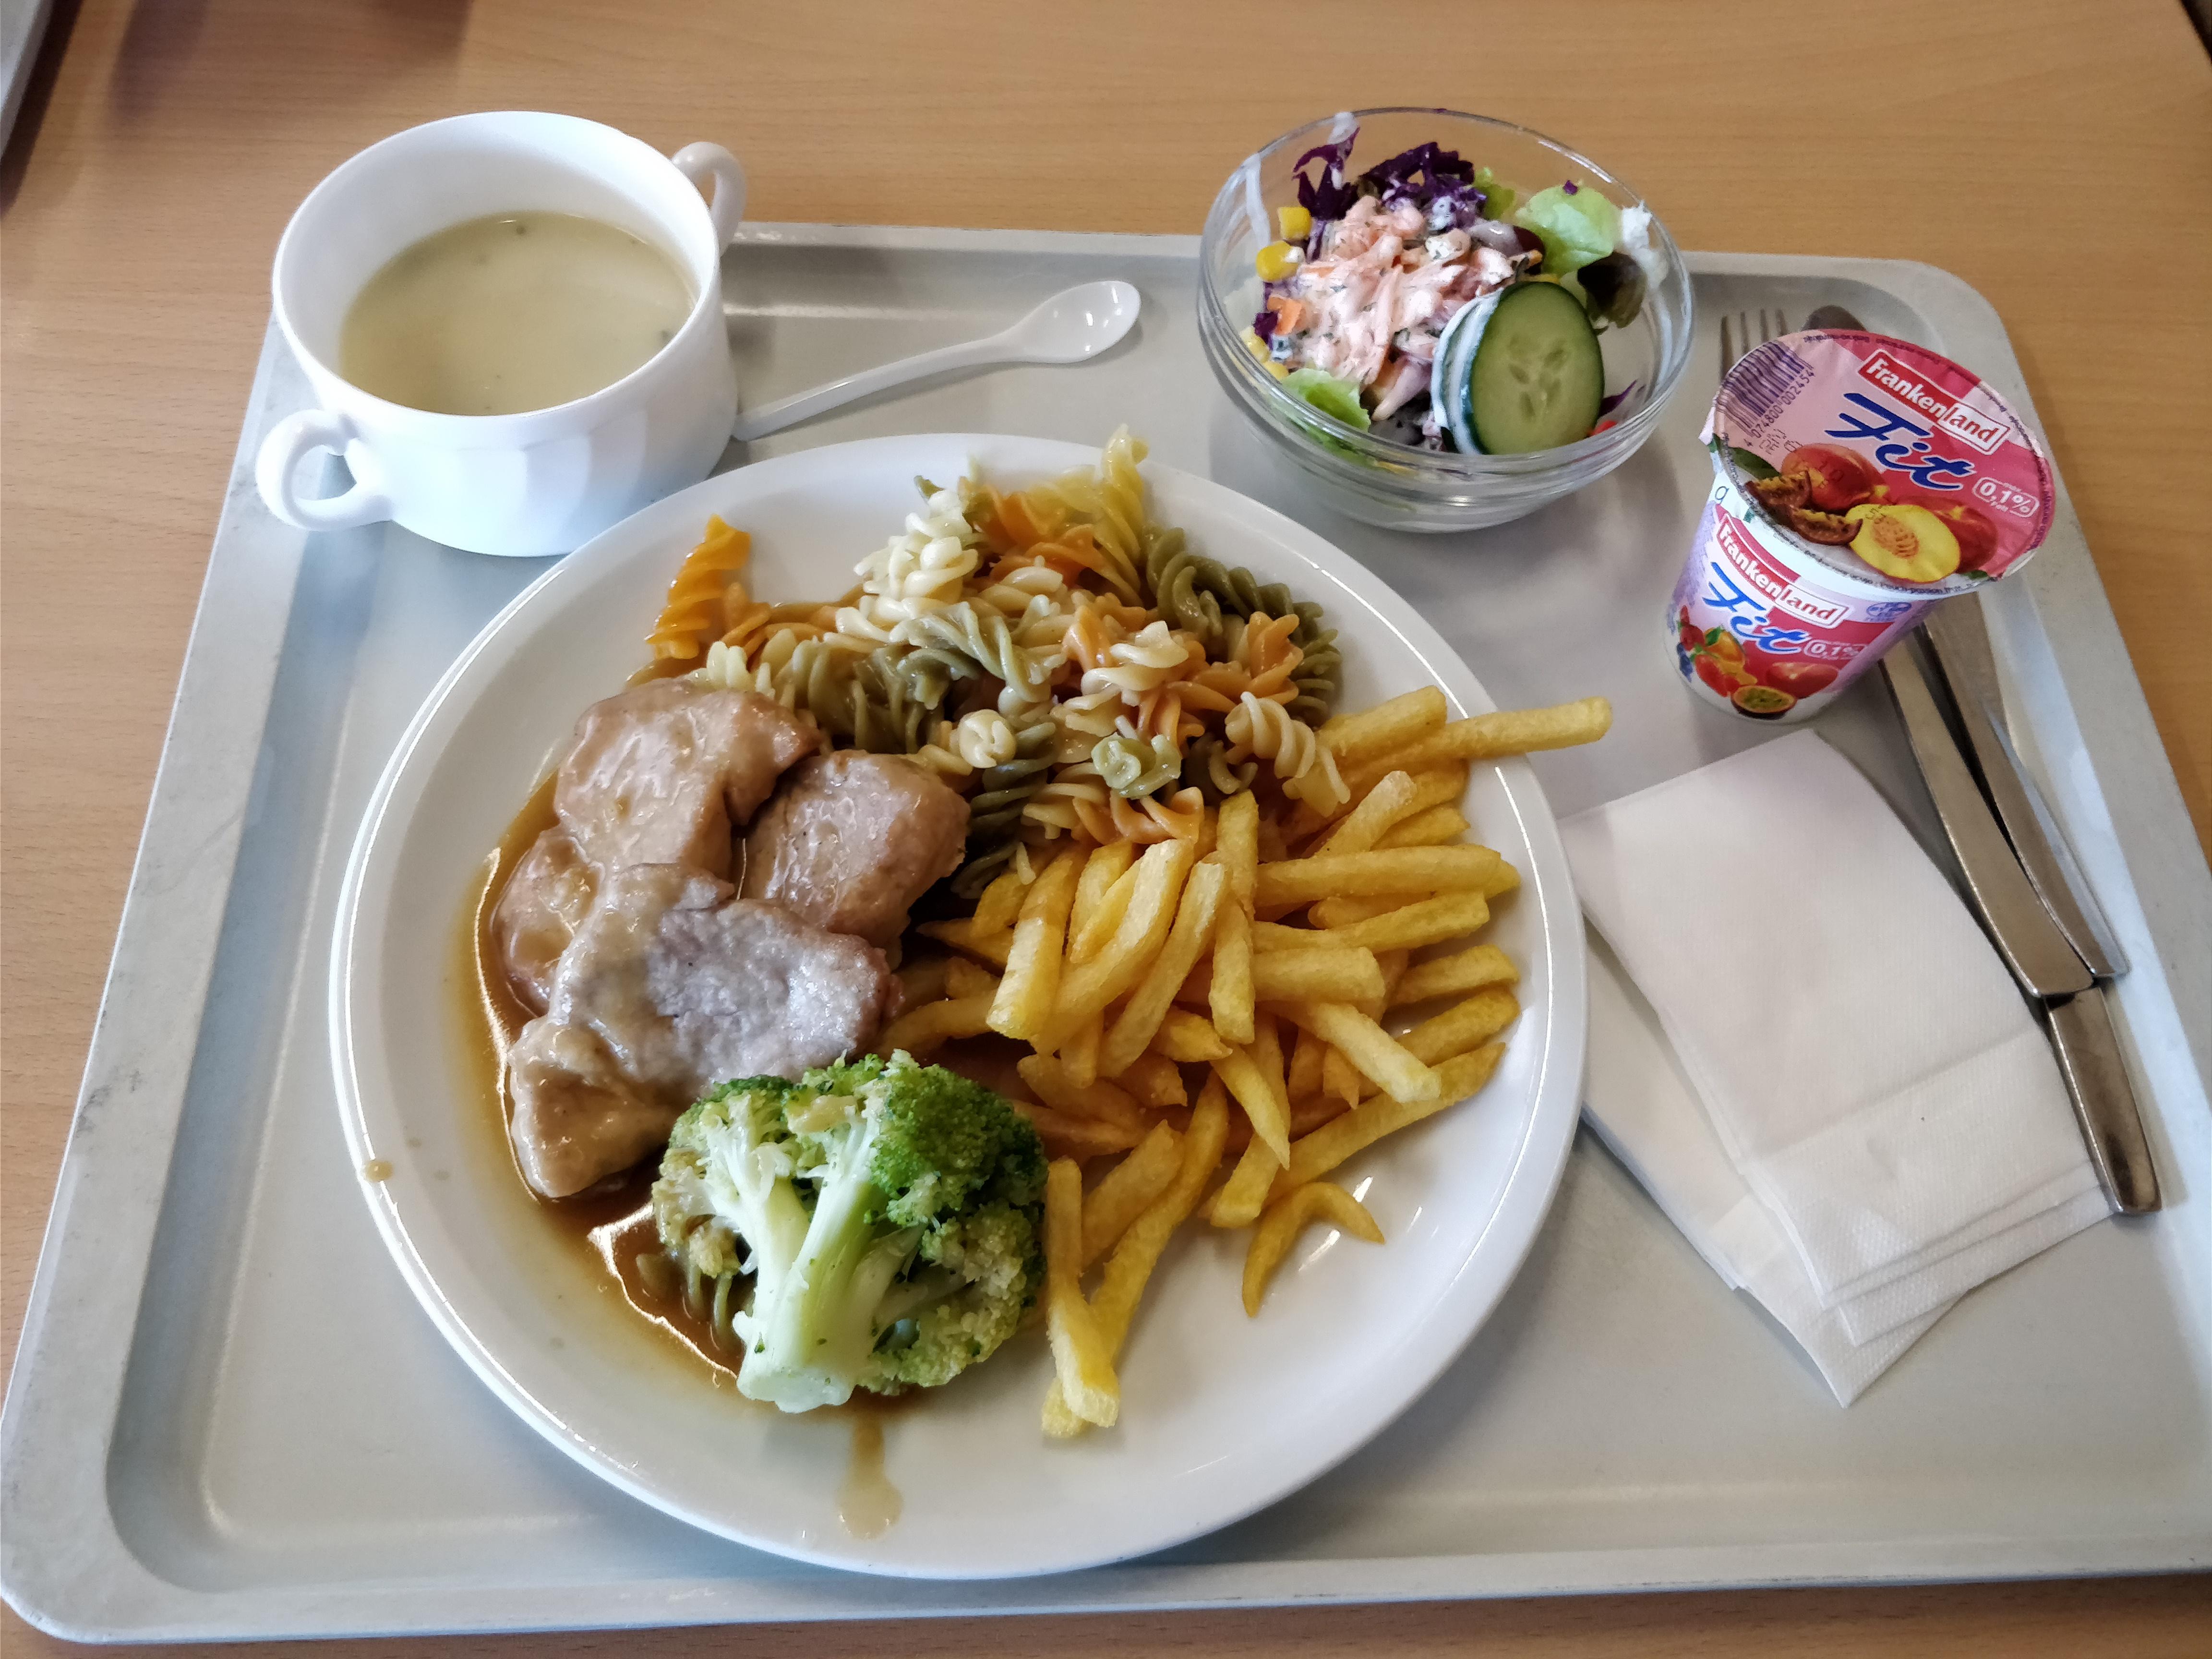 https://foodloader.net/nico_2017-09-21_schweinelendchen-nudeln-pommes-brokkoli-suppe-salat-joghurt.jpg